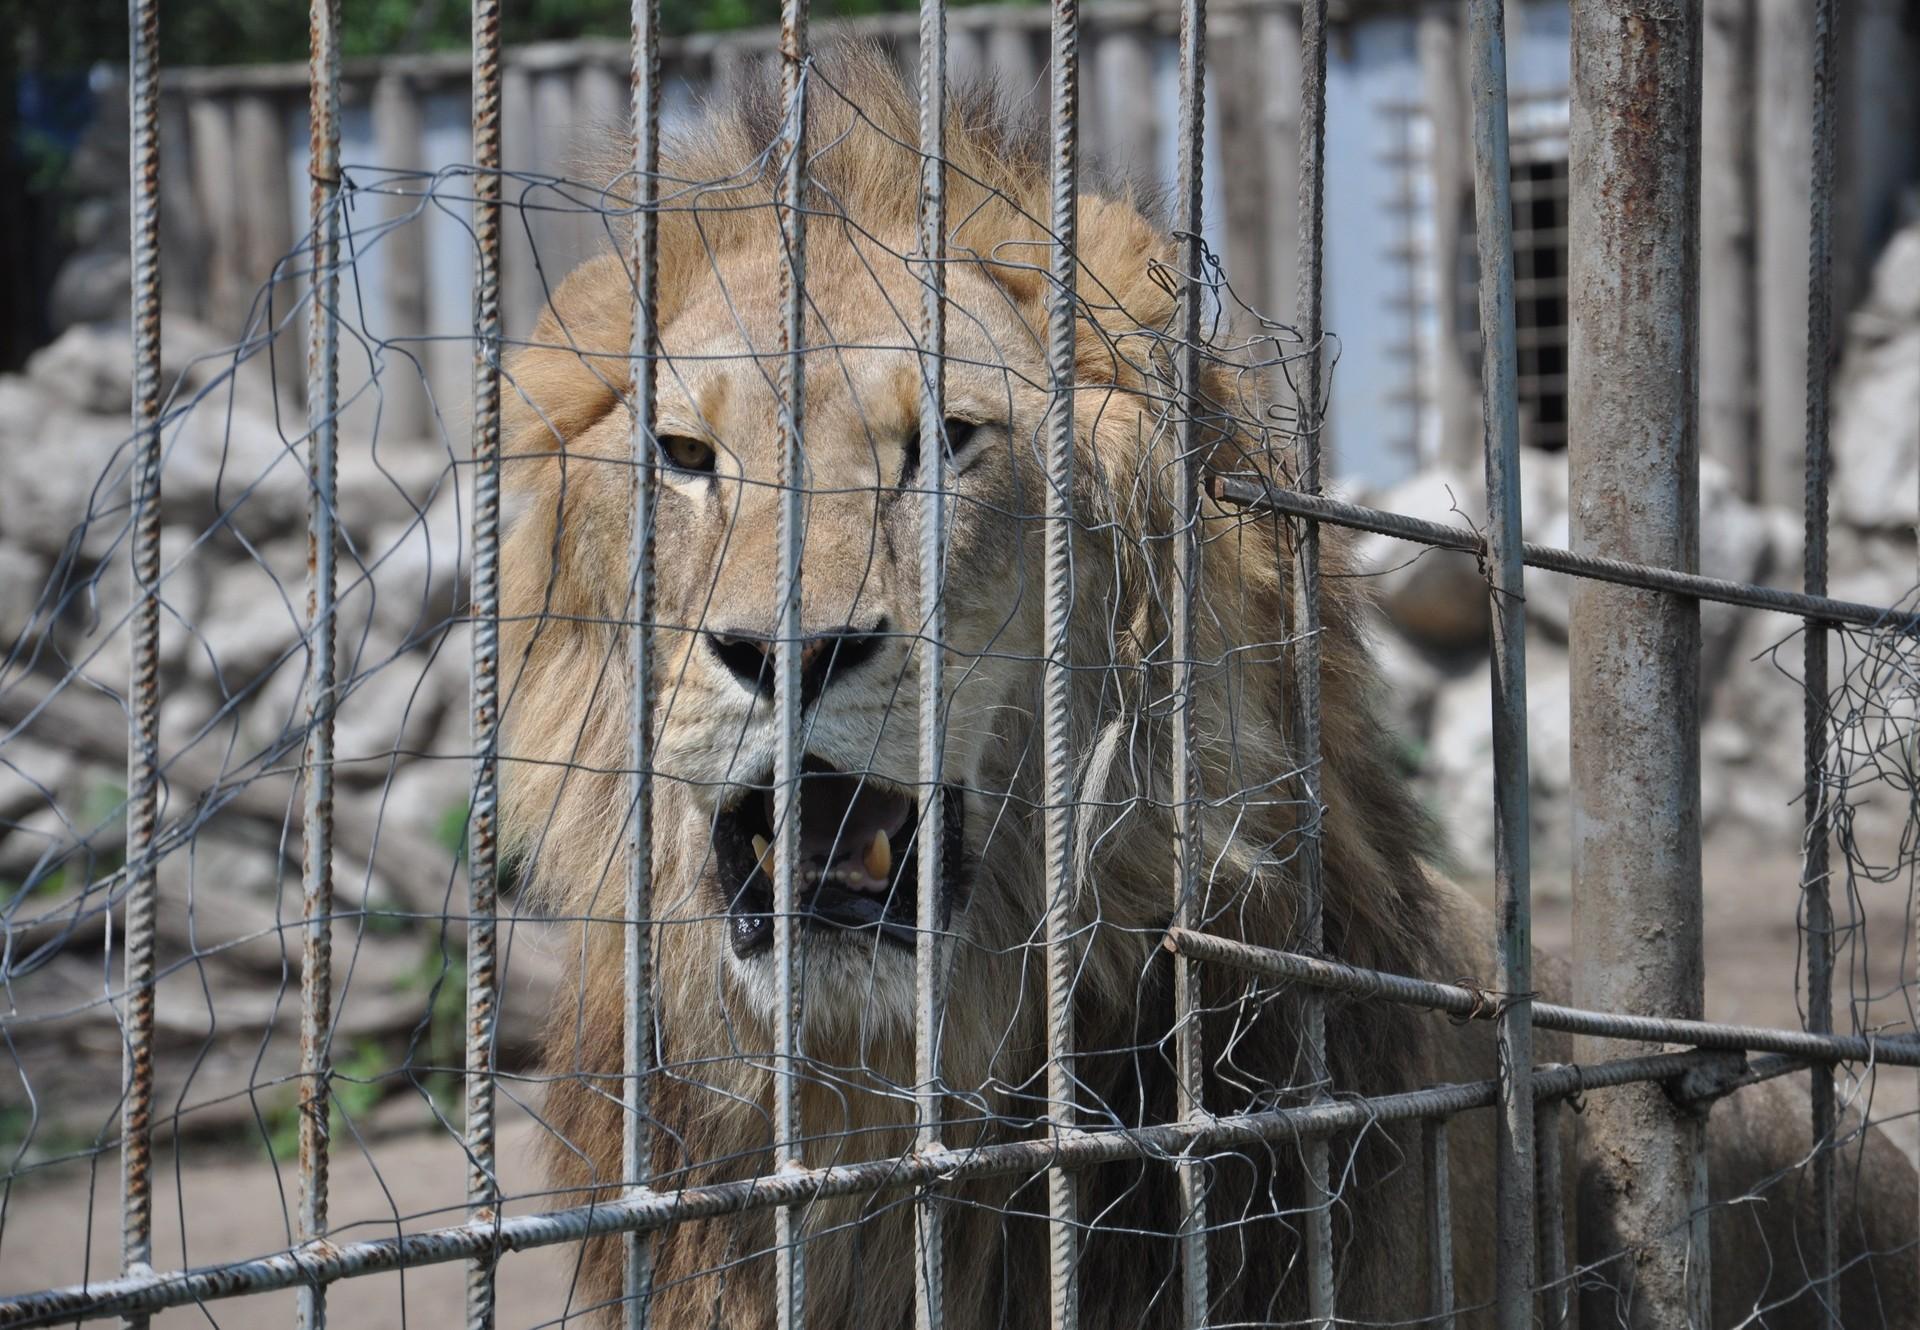 Help save lion Simba and siblings